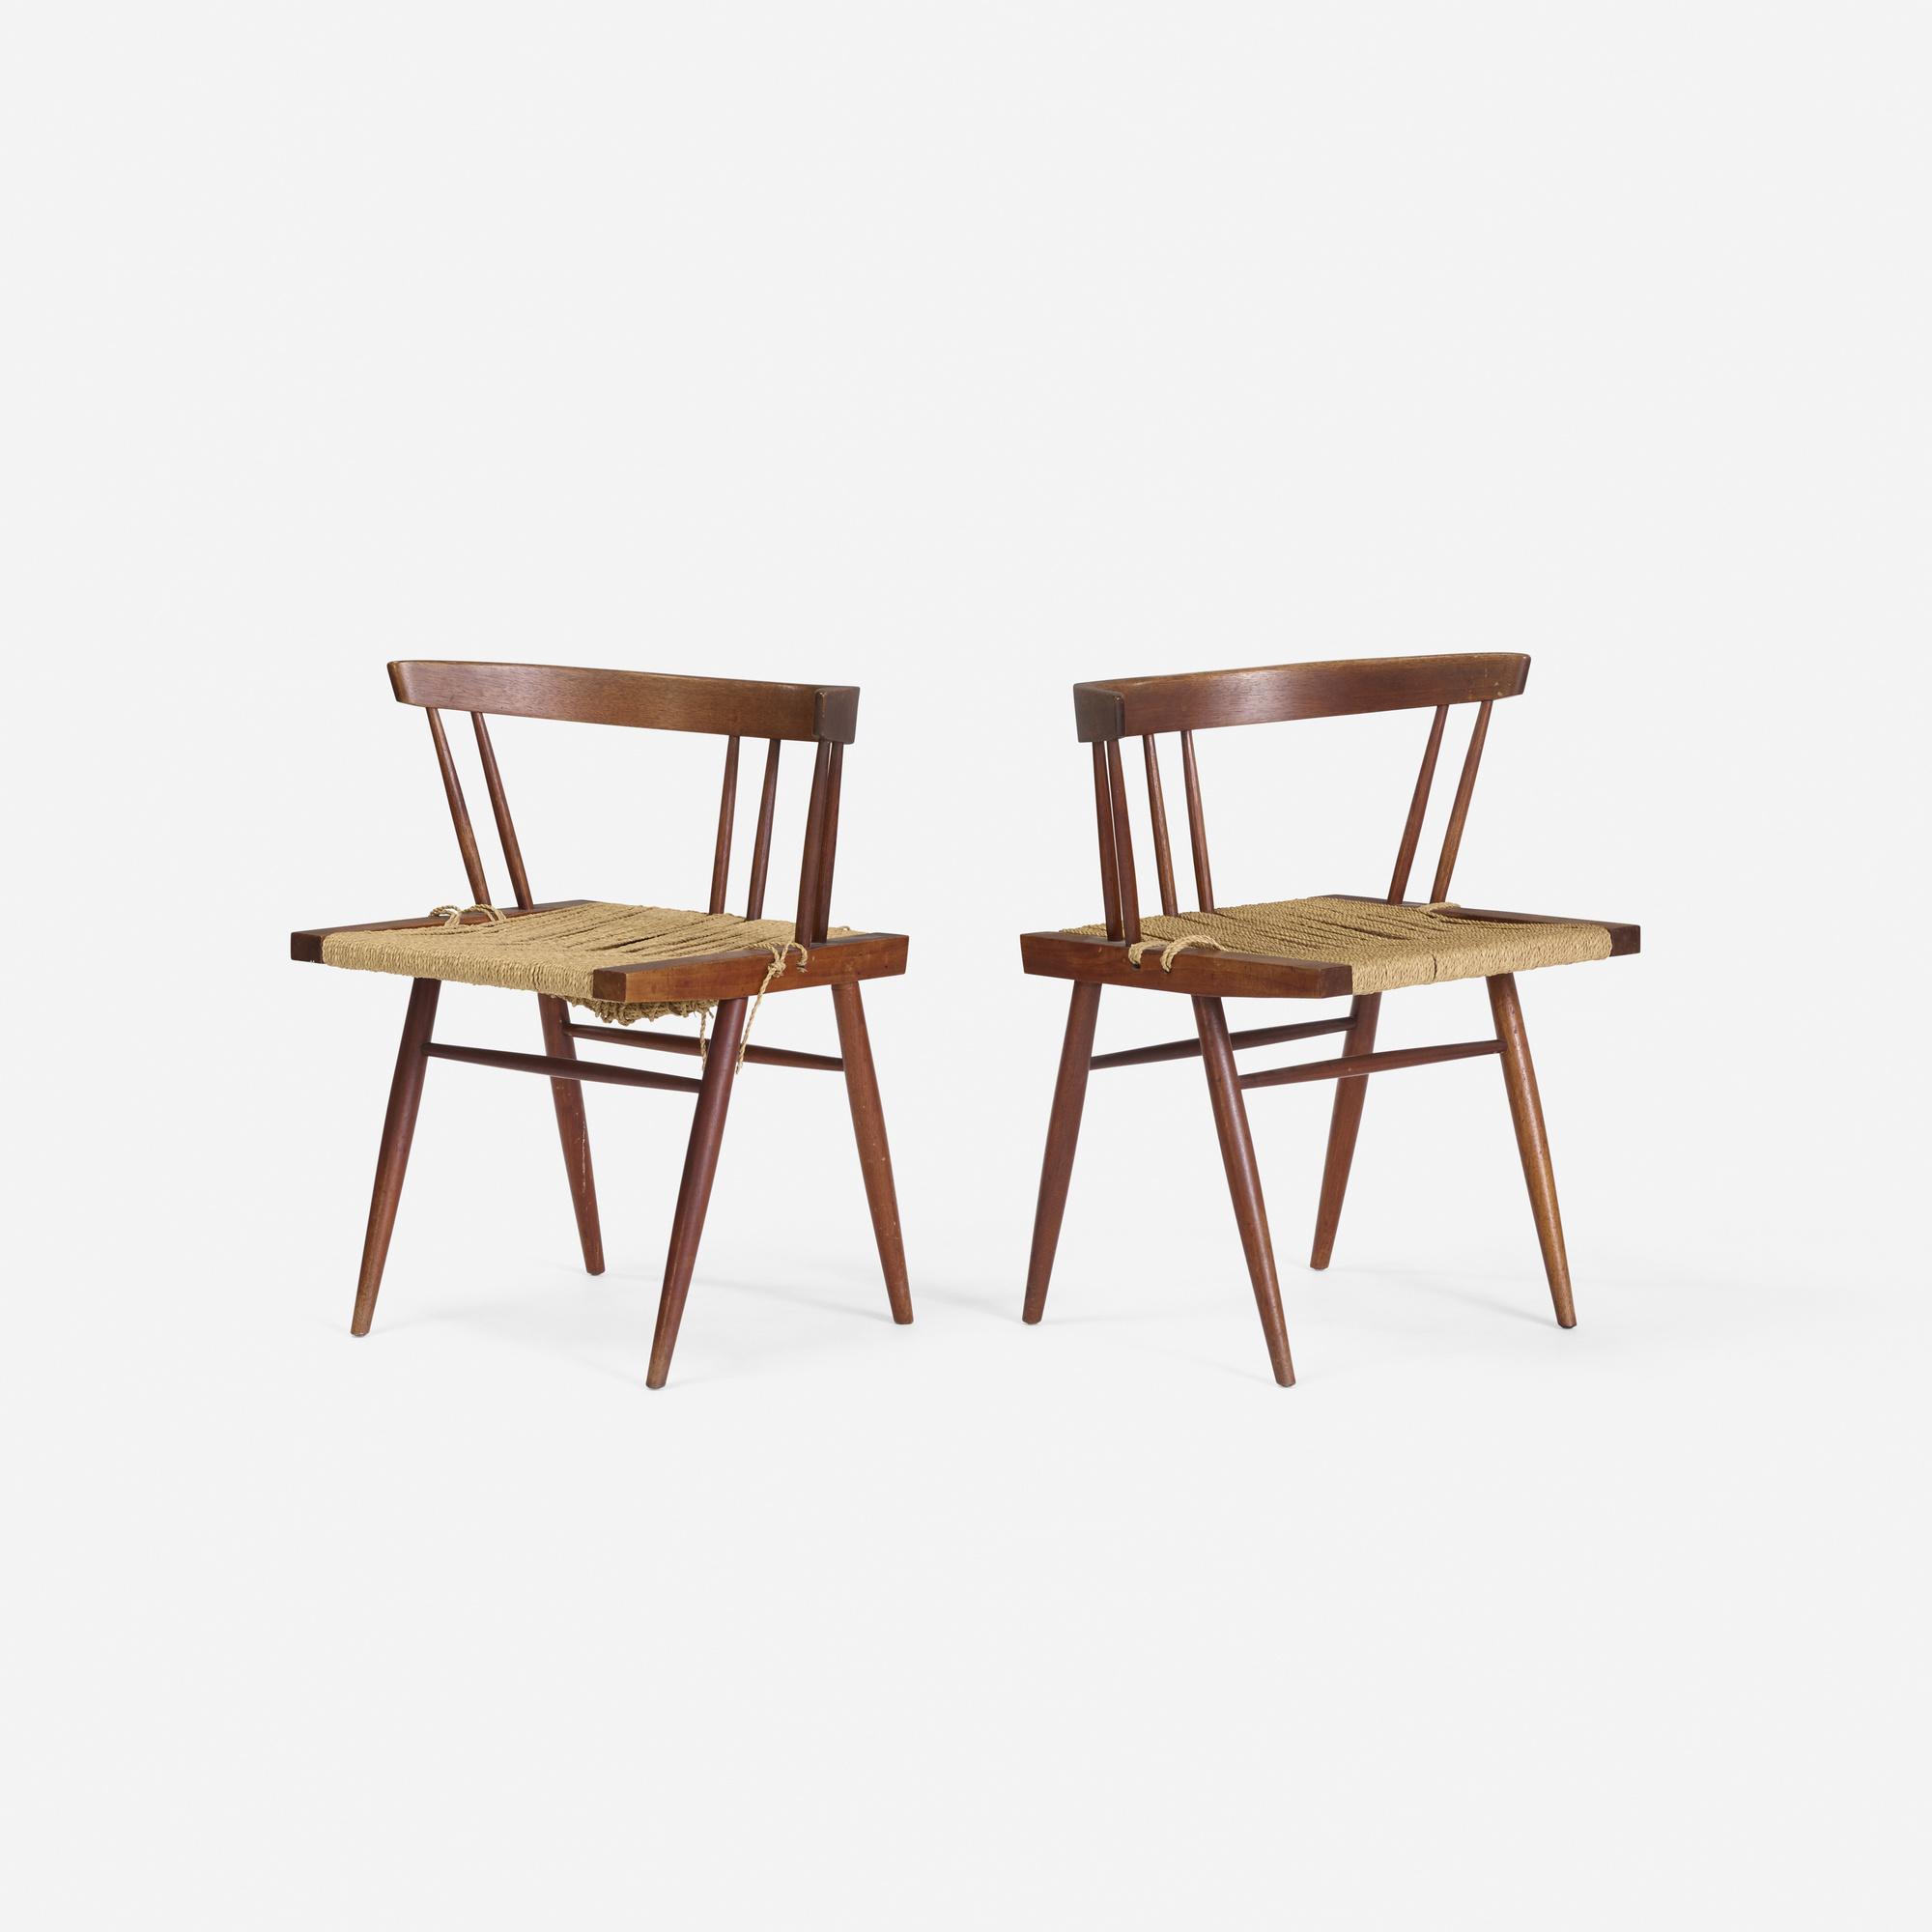 181: George Nakashima / Grass-Seated chairs, pair (1 of 1)